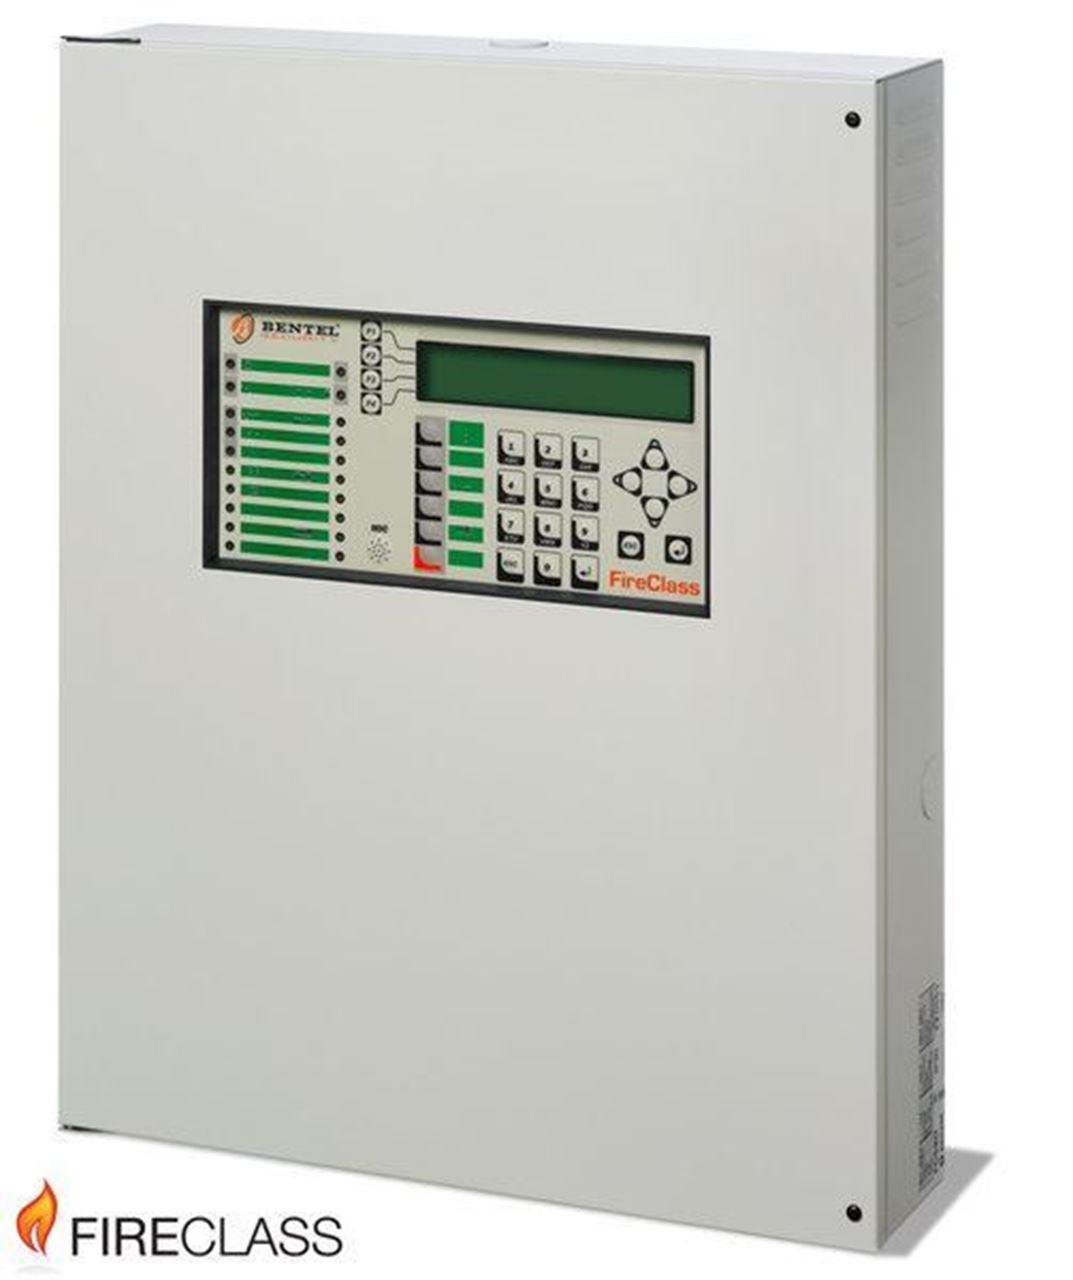 Bentel security FC510 - 1-Loop Control Panel Armenia Vantag LLC